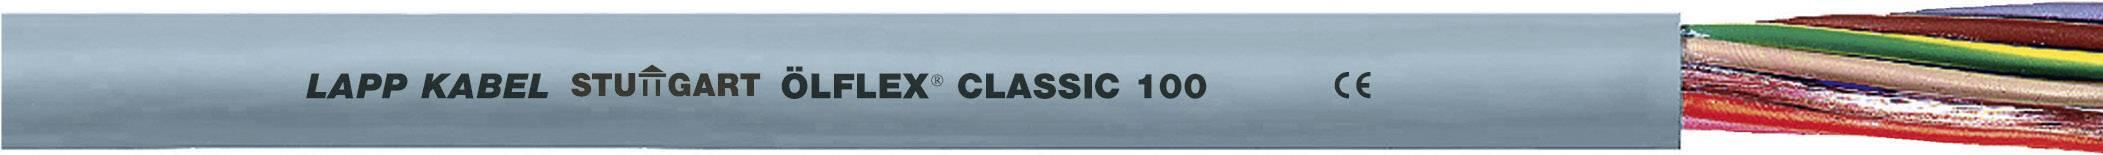 Kabel LappKabel Ölflex CLASSIC 100 3X0,75 (00101254), PVC, 5,7 mm, 500 V, šedá, 300 m